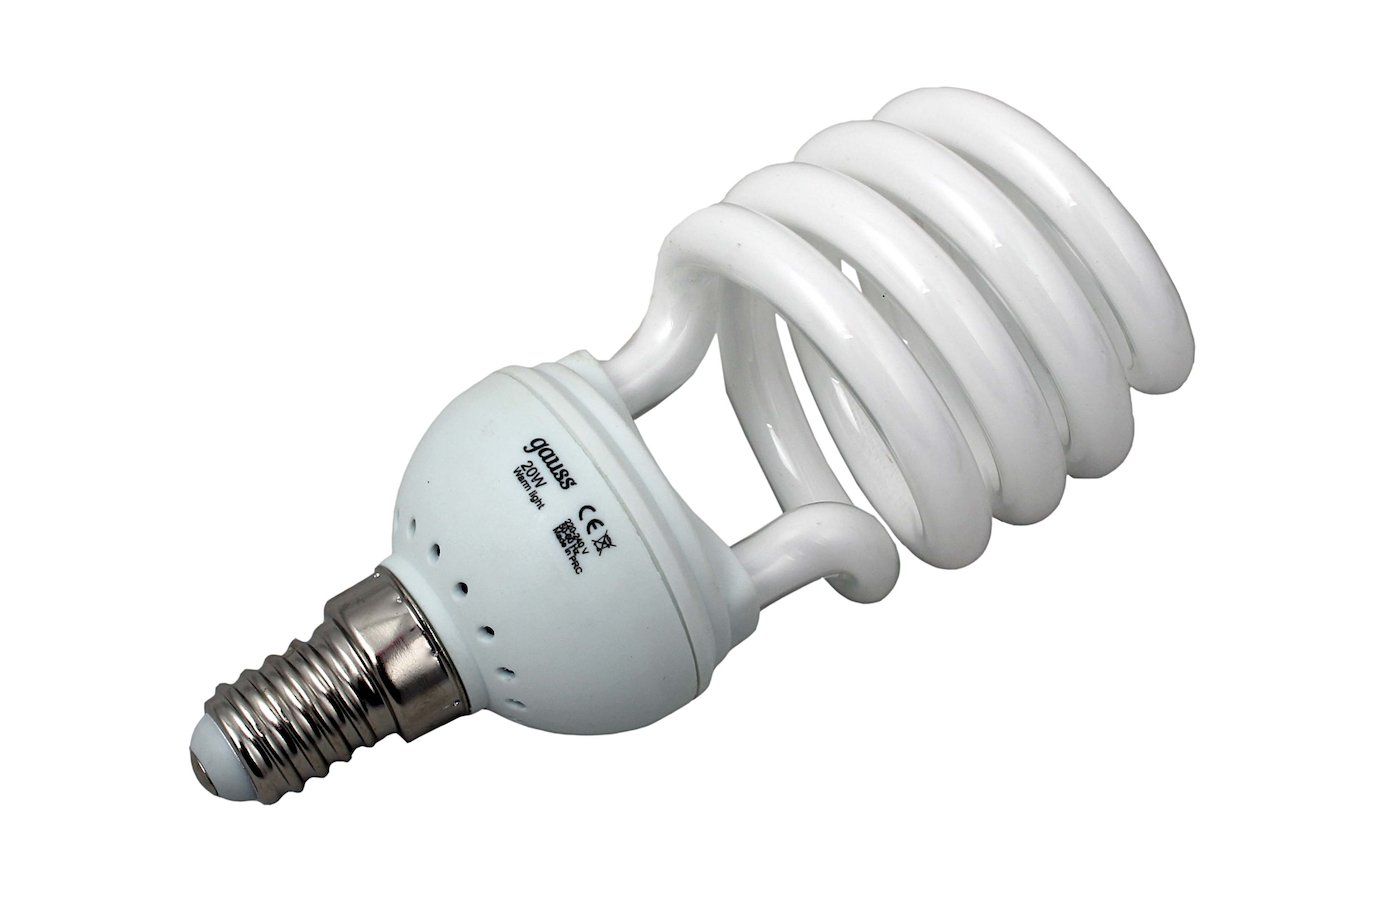 Лампочки энергосберегающие Gauss Spiral T2 20W 2700K E14